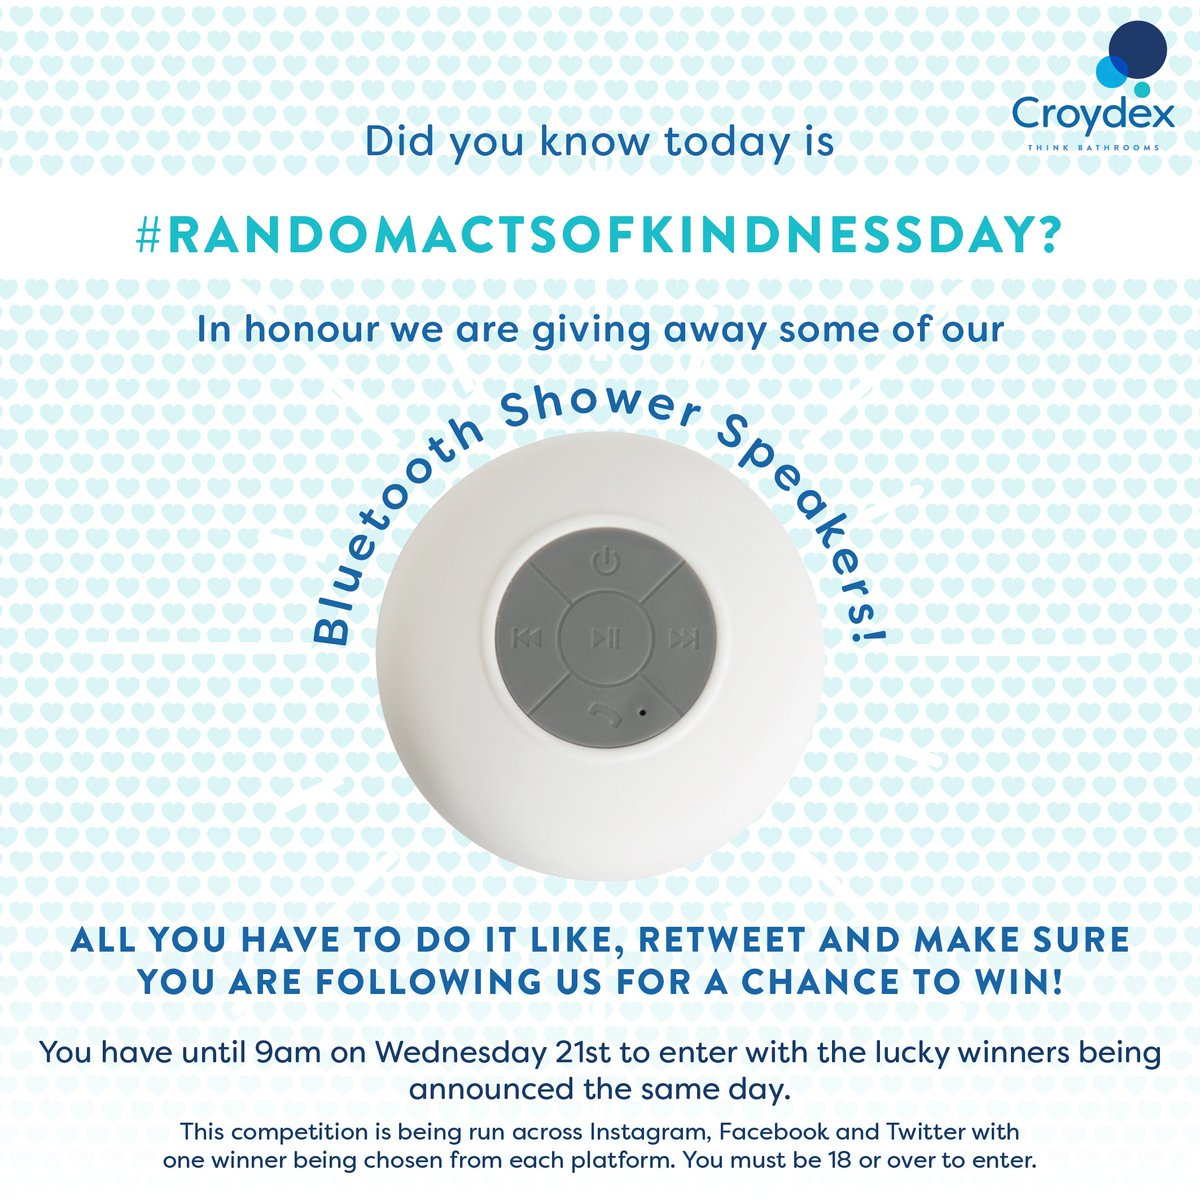 #RandomActsOfKindnessDay